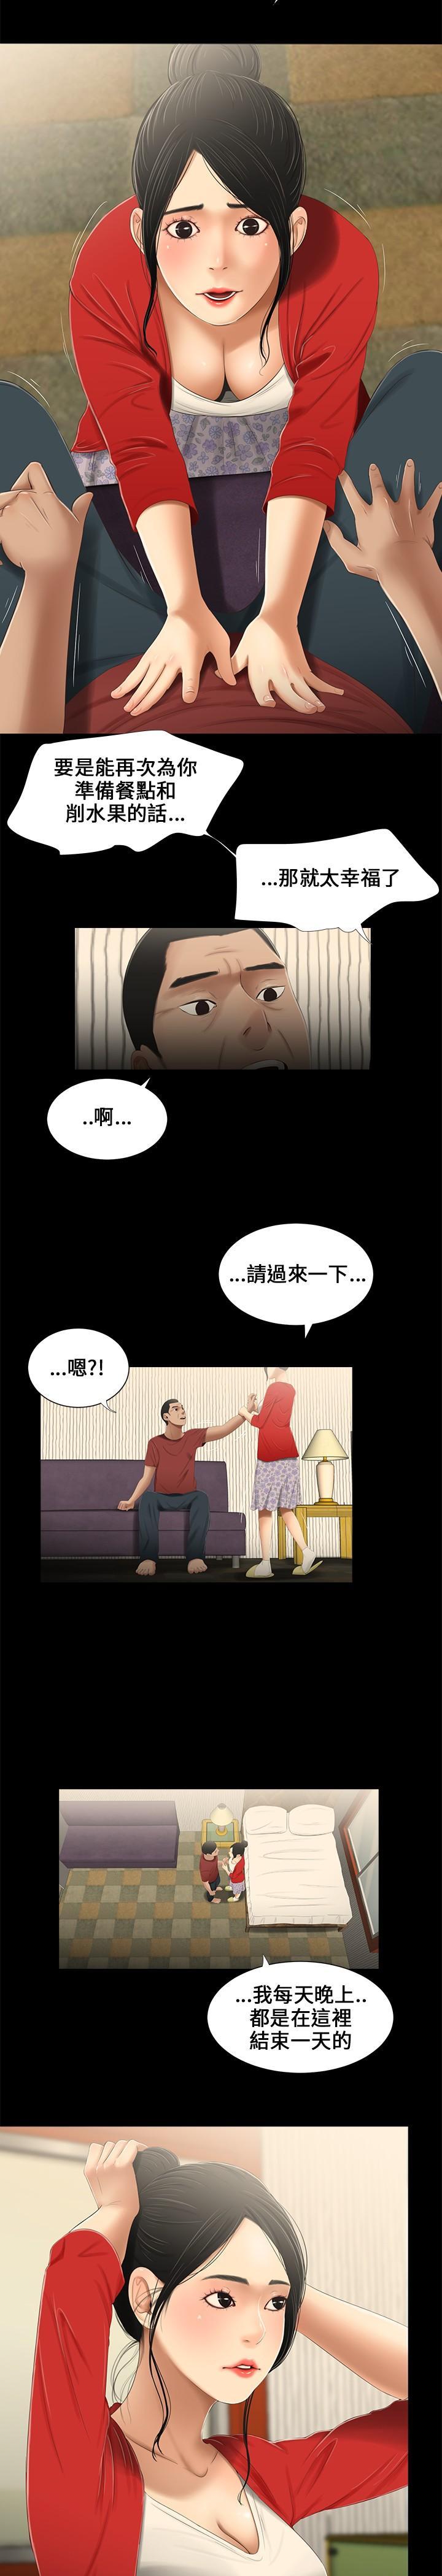 Three sisters 三姐妹Ch.13~19 (Chinese)中文 26